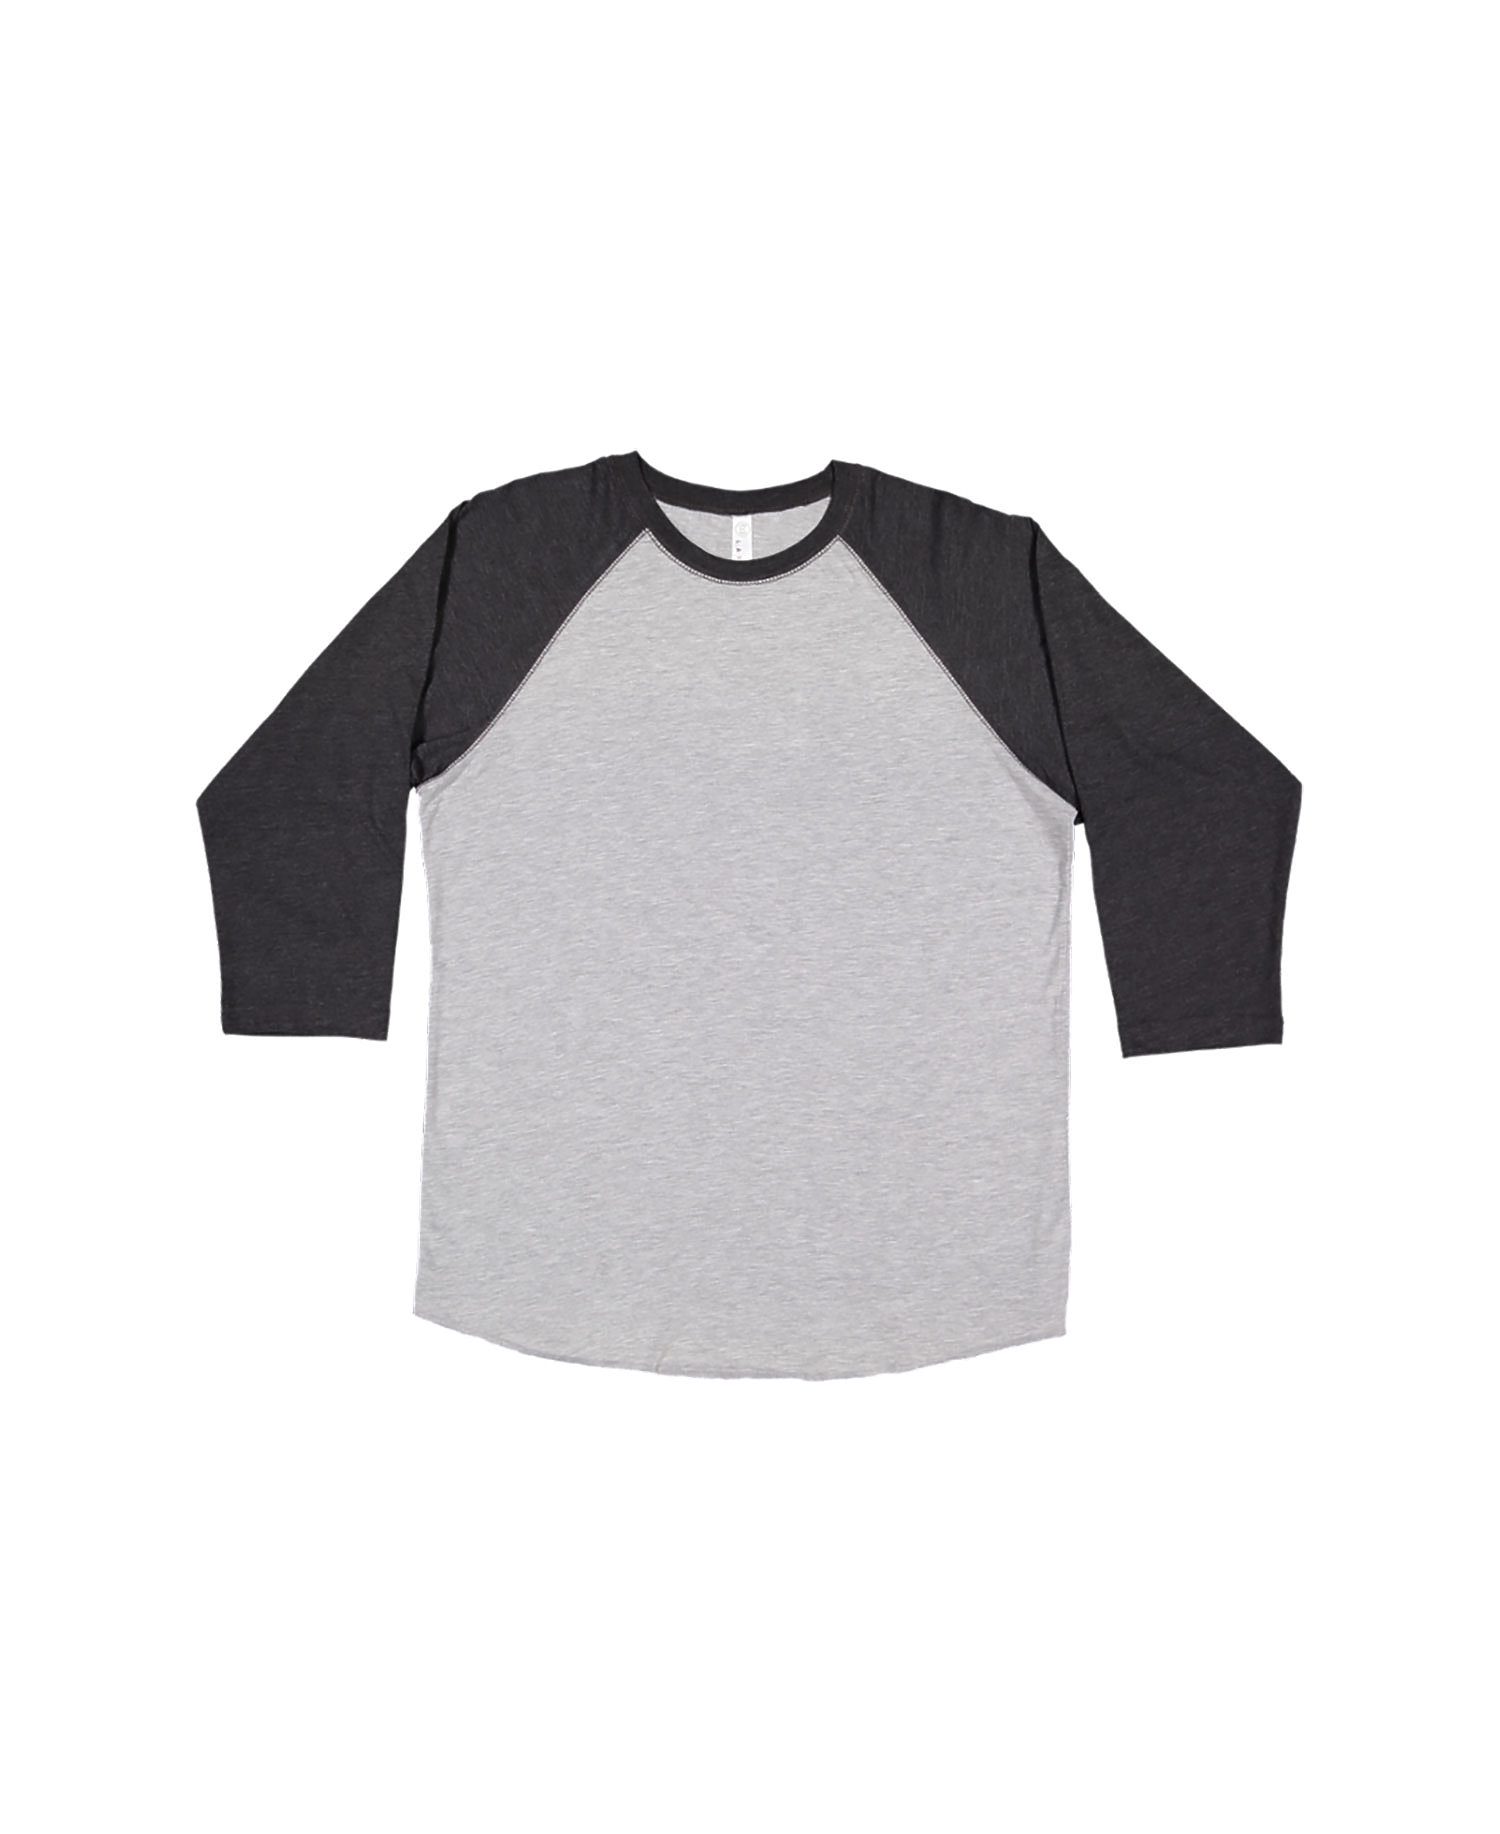 90c27485b3d Vintage Sports T-Shirts - CafePress